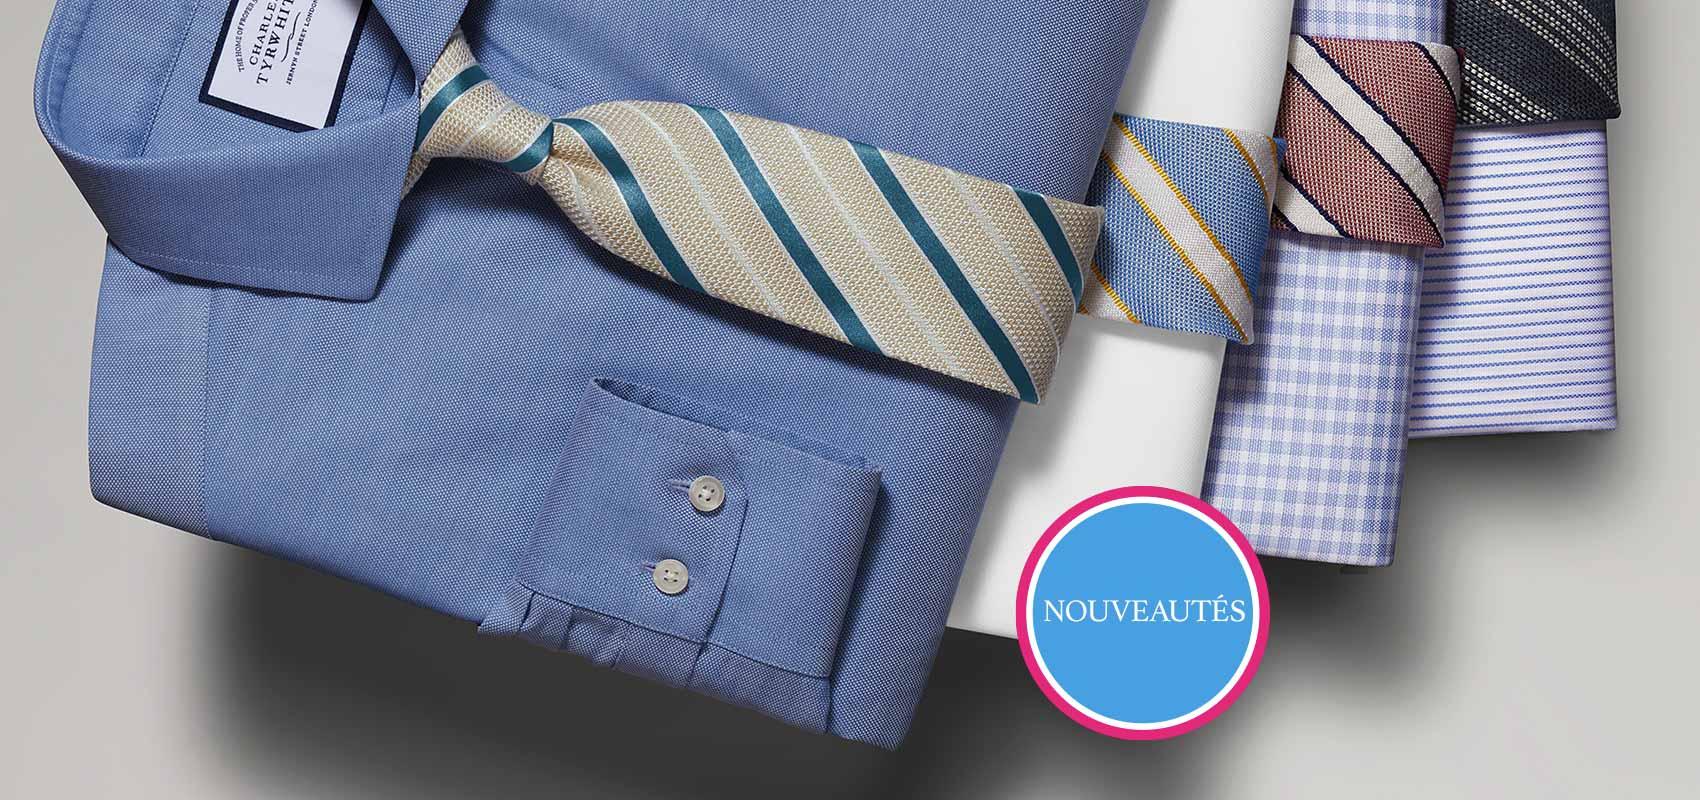 Charles Tyrwhitt cotton stretch oxford shirts